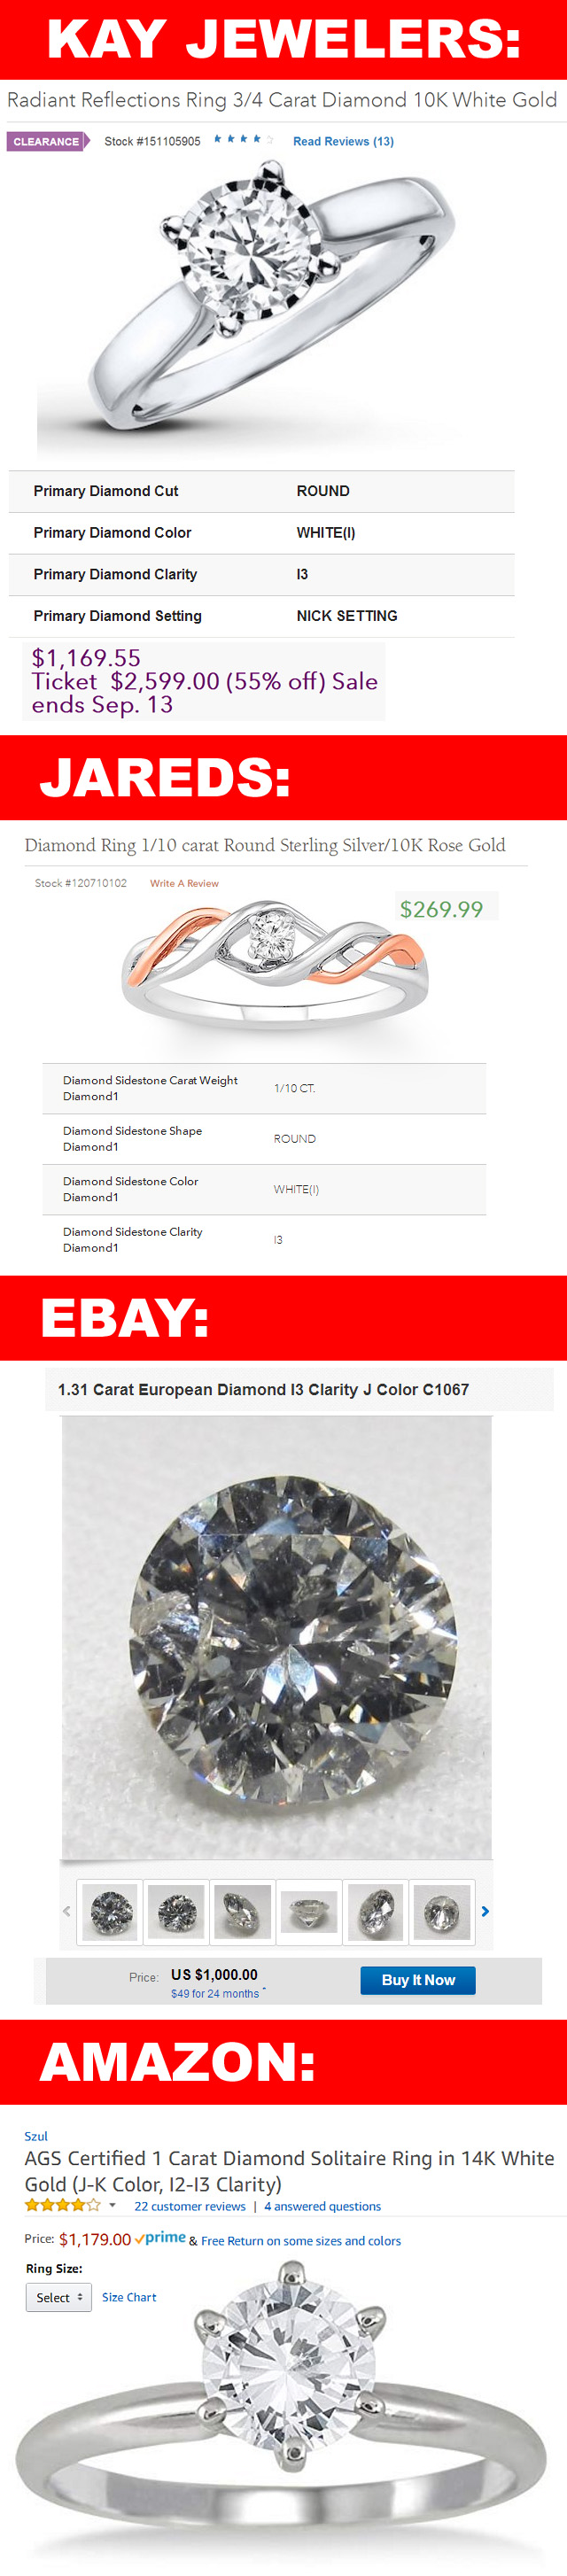 Where To Buy I3 Clarity Diamonds